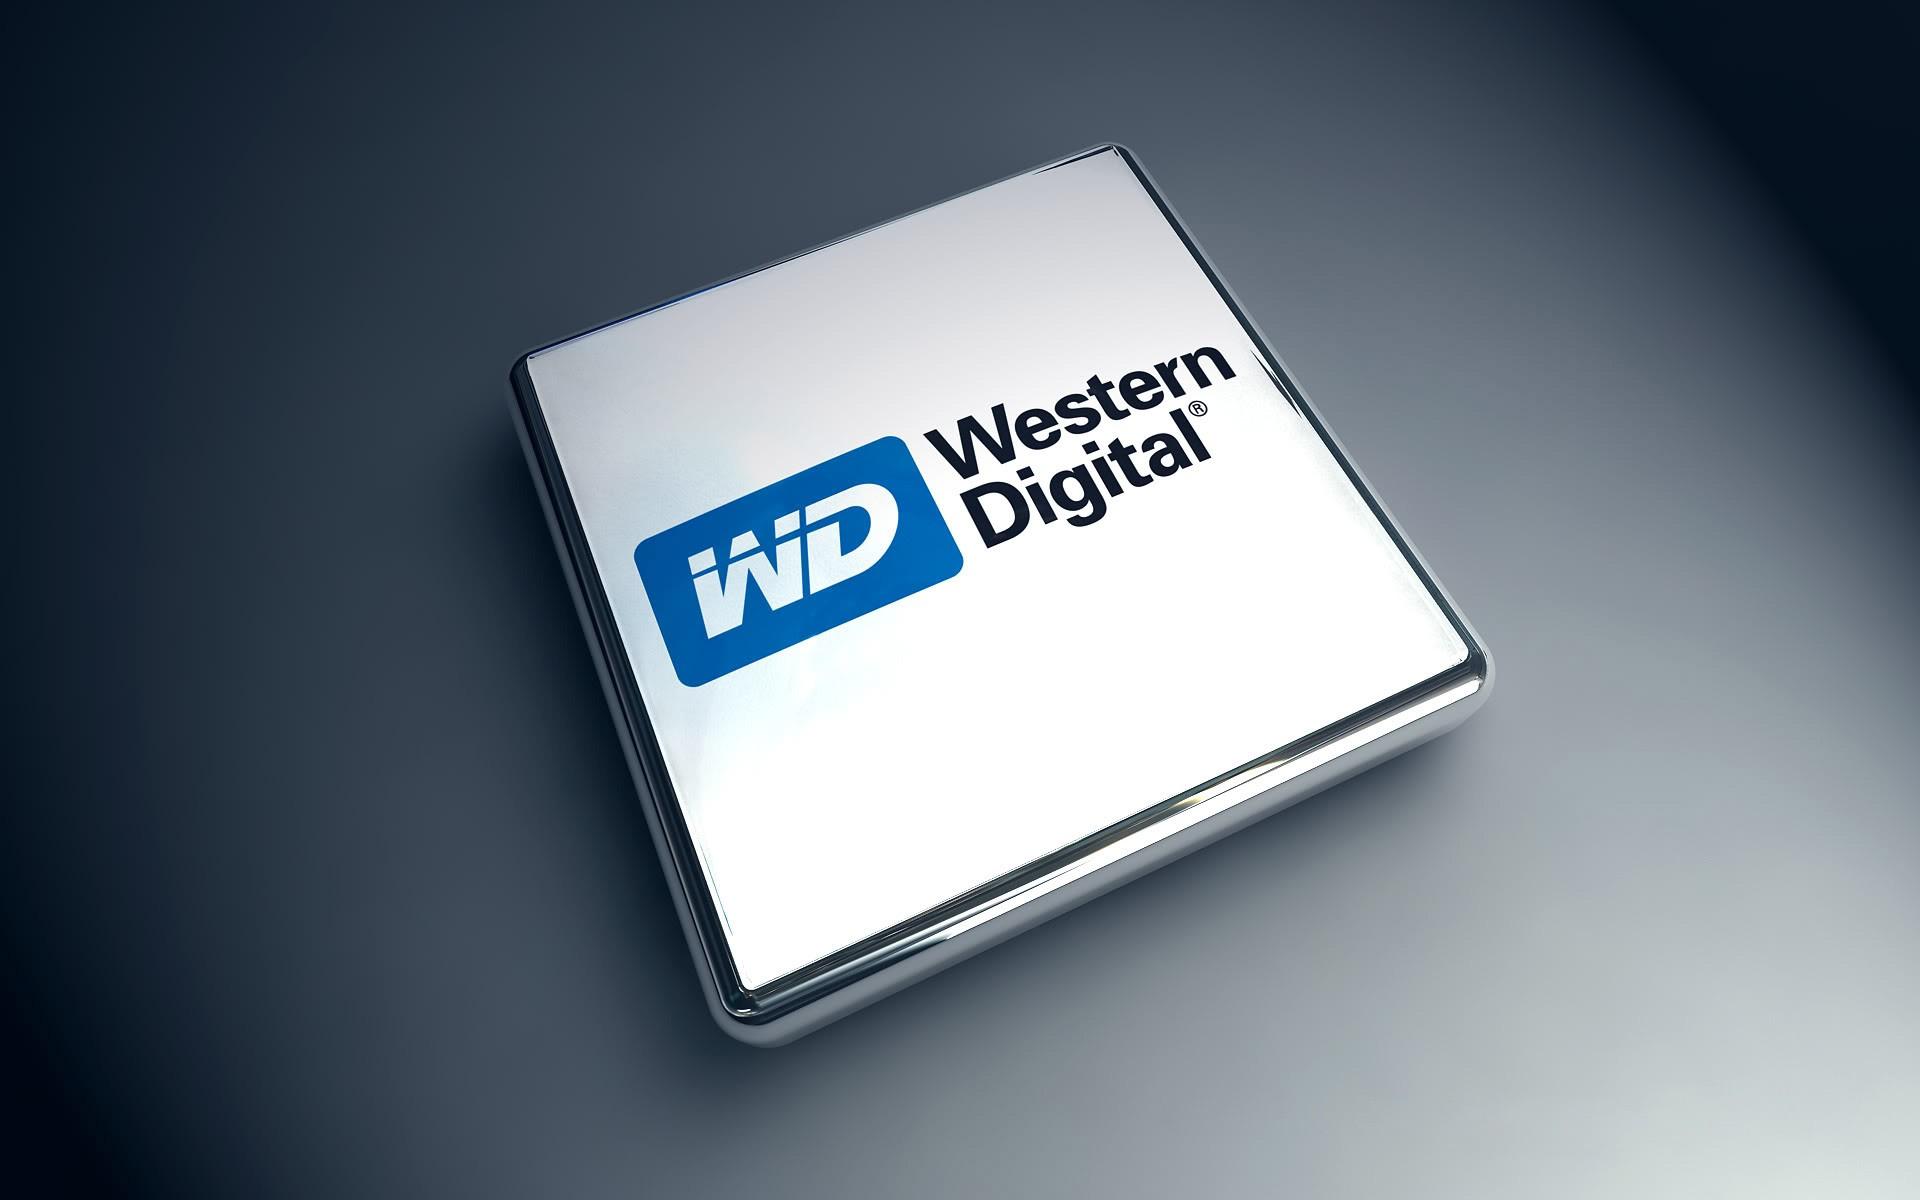 Western Digital Updates Firmware for My Cloud Storages - Get Version